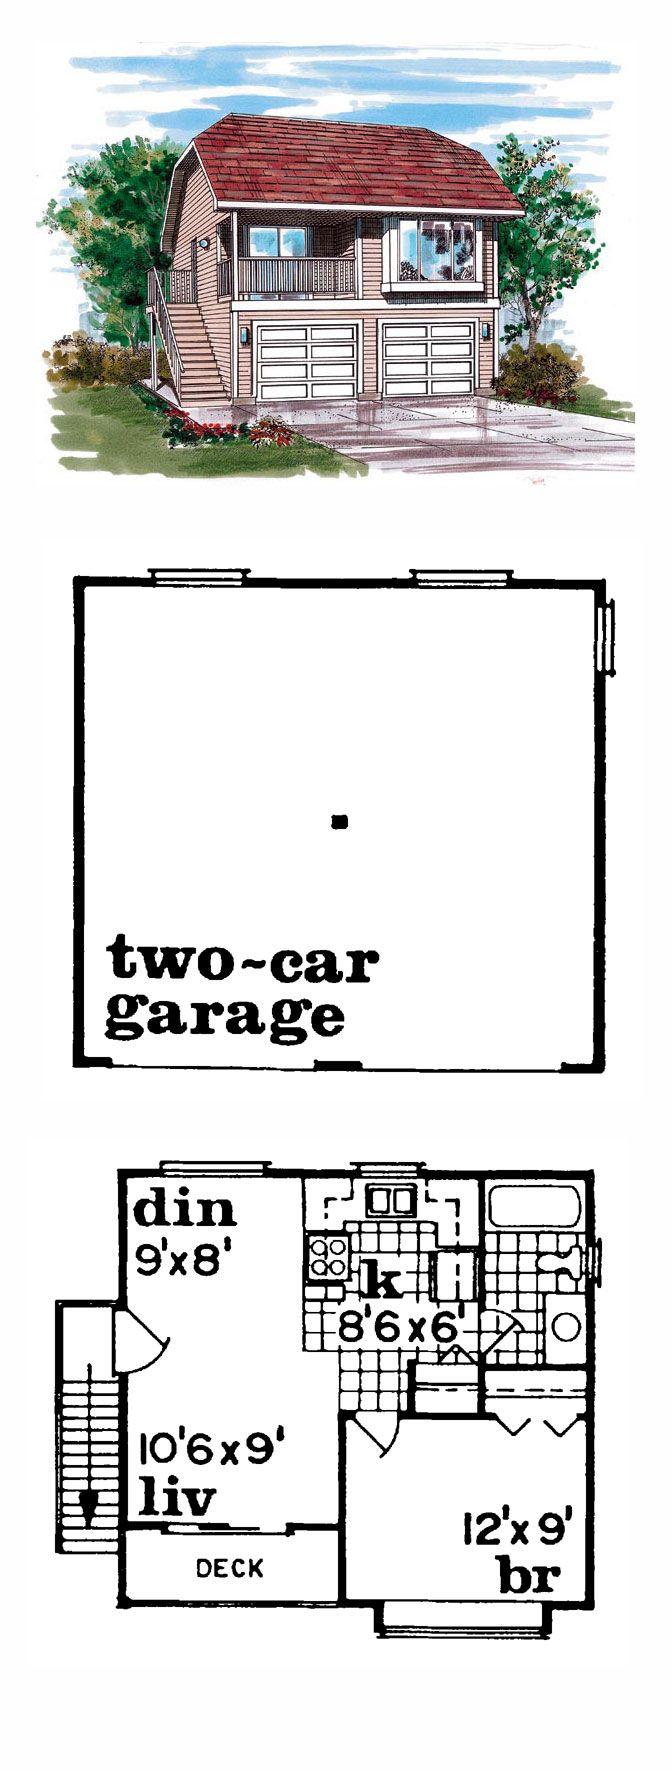 garage plan 96220 garage apartment plans garage apartments and contemporary garage plan 55543